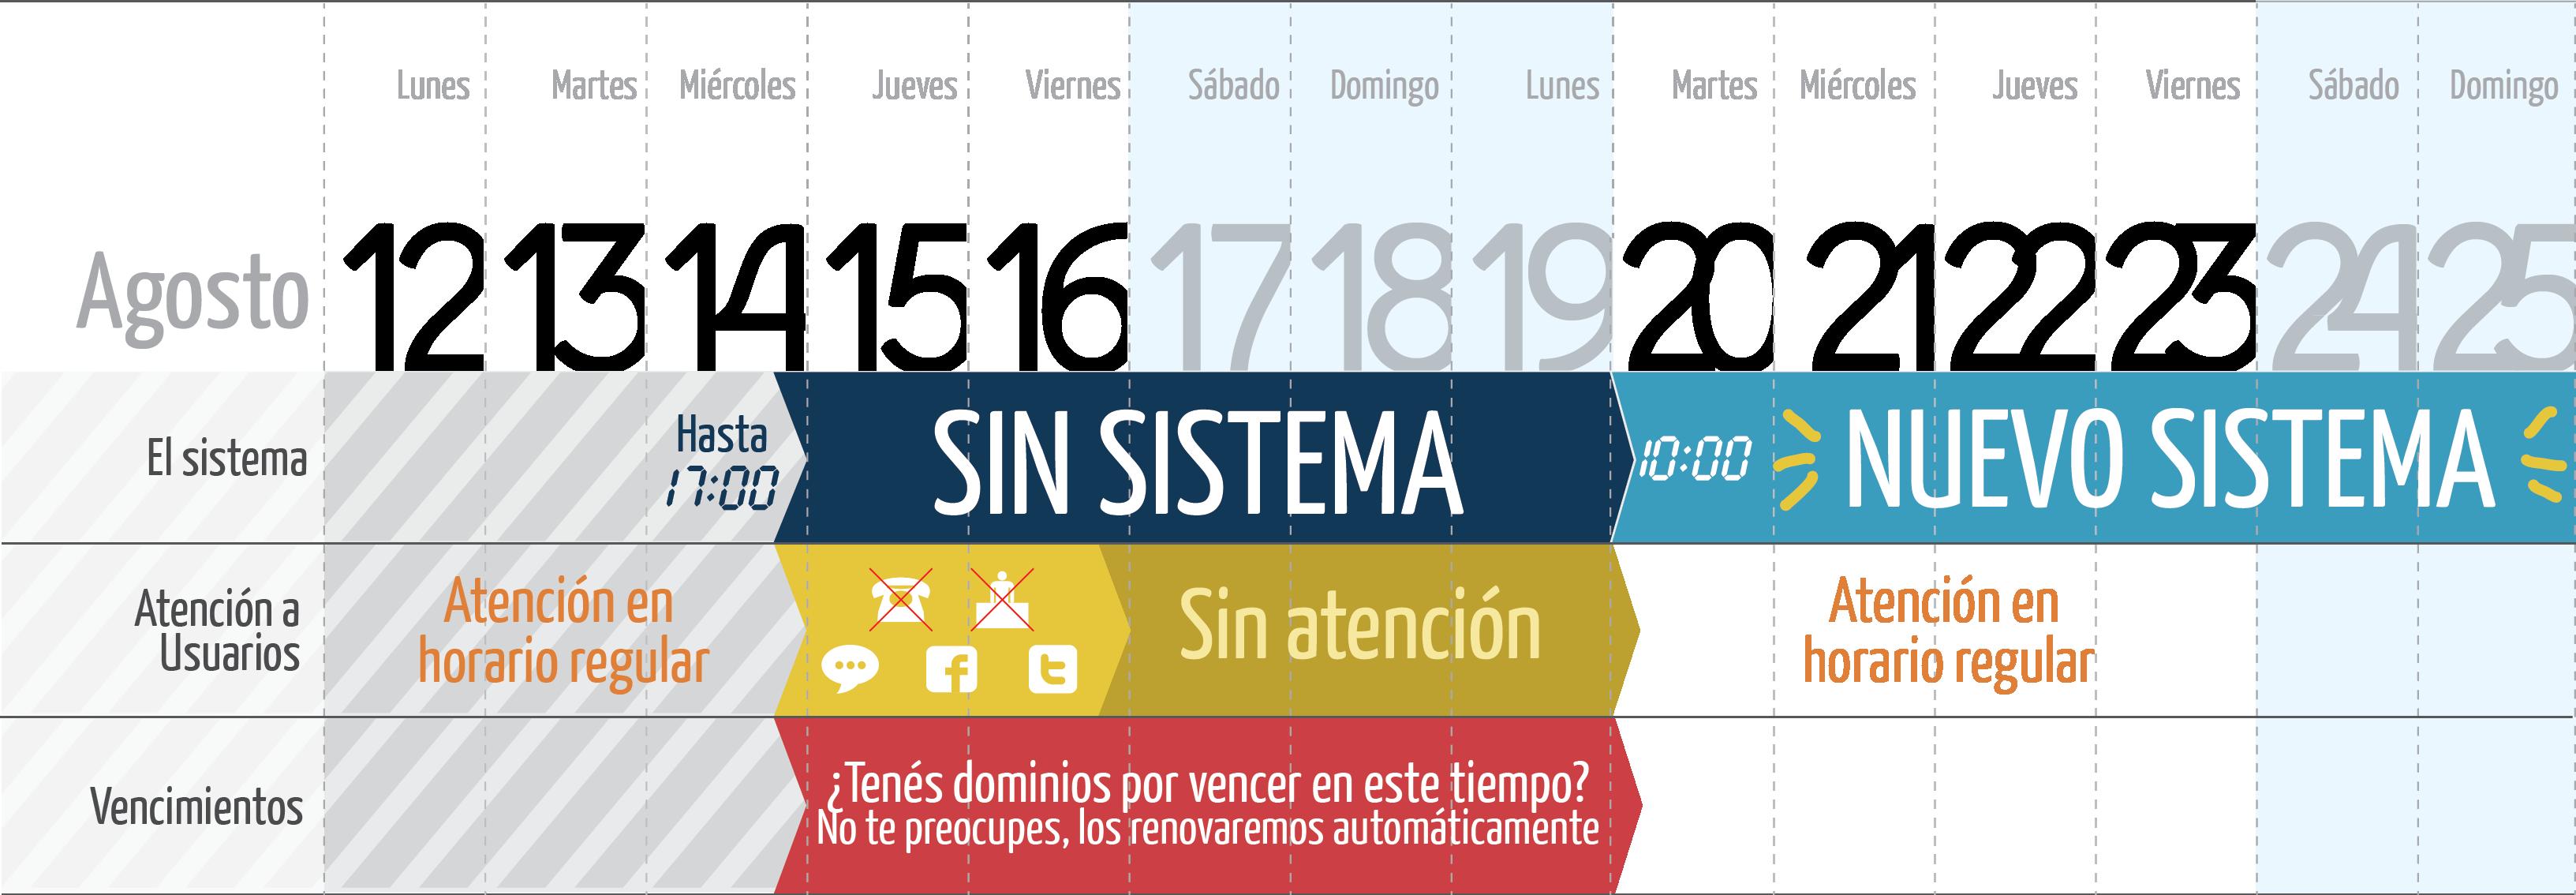 Timeline-Nuevo-Sistema-Nic-Argentina-Informatica-Legal